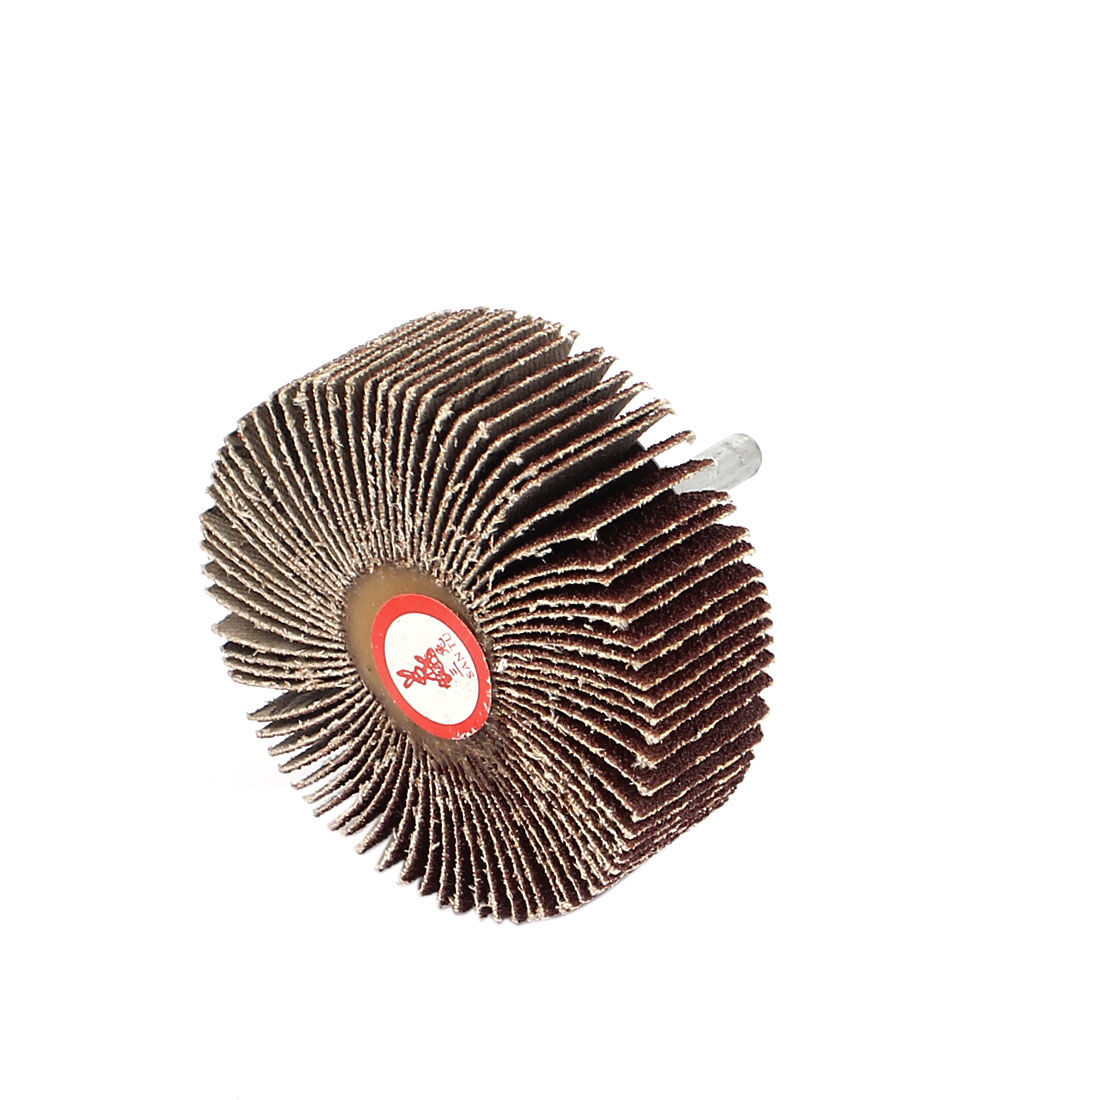 69mmx6mm Flap Wheel Disc Grinding Polishing Tool w Handles